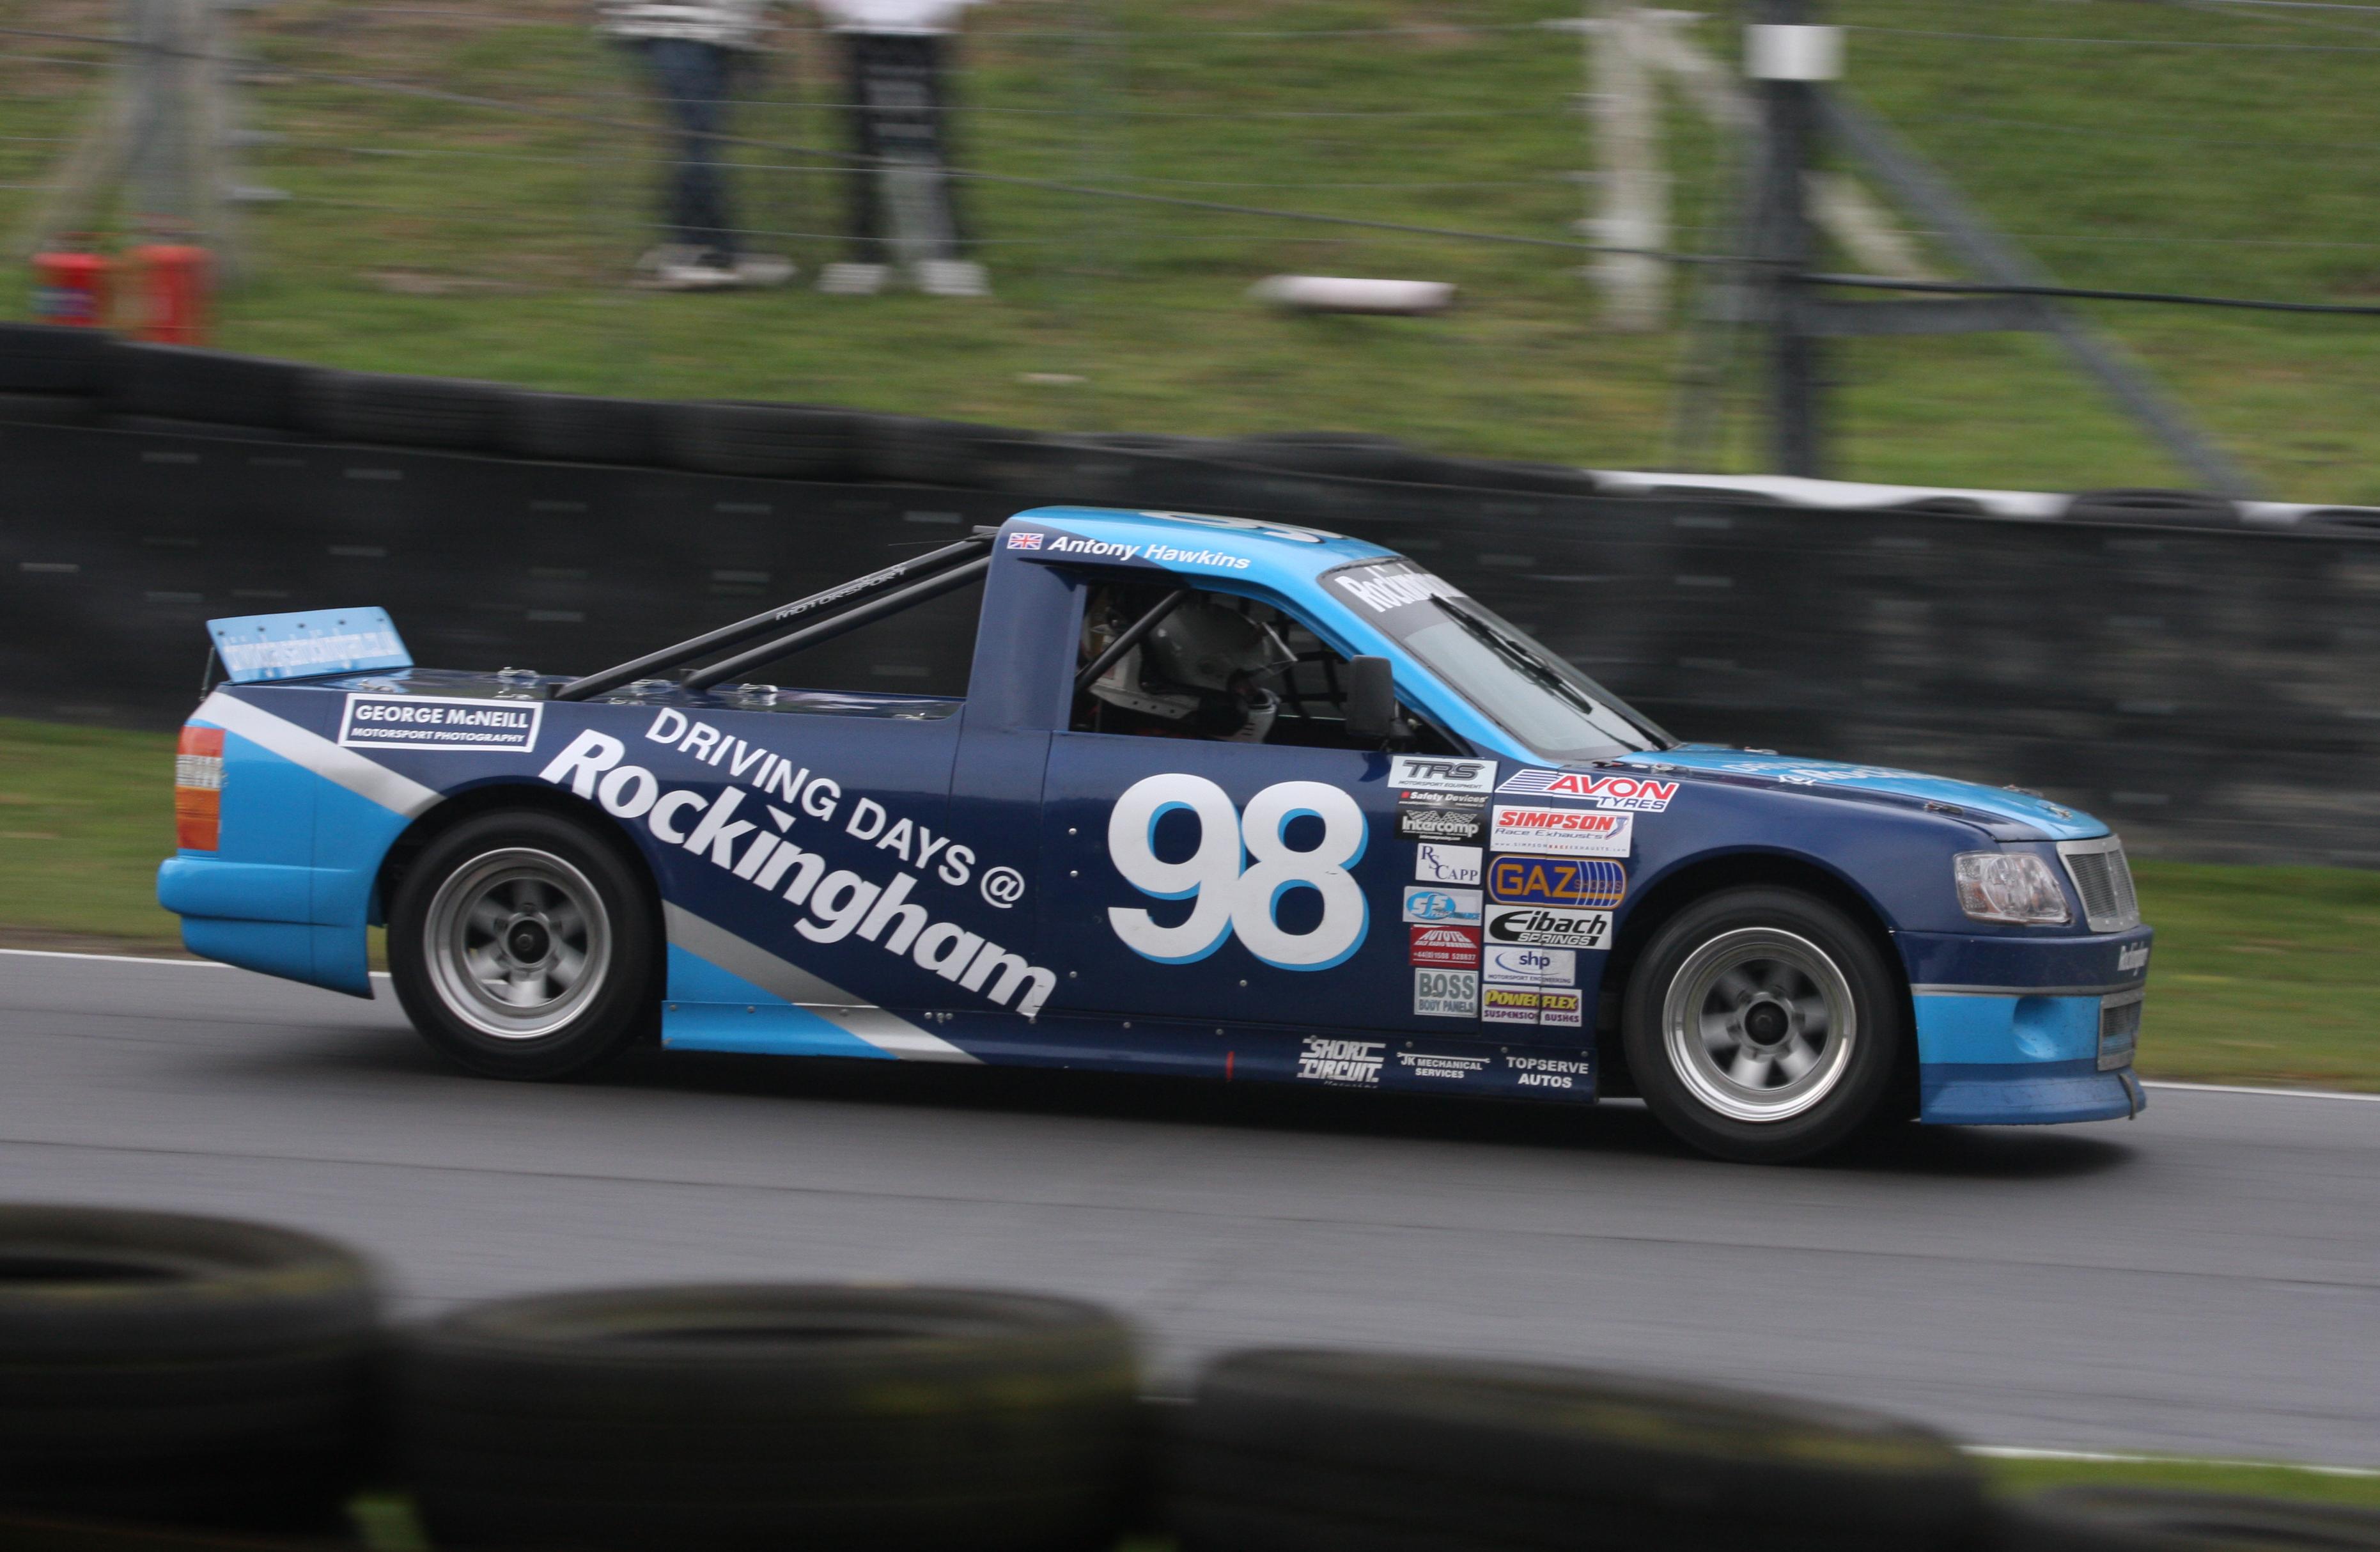 Pickup truck racing